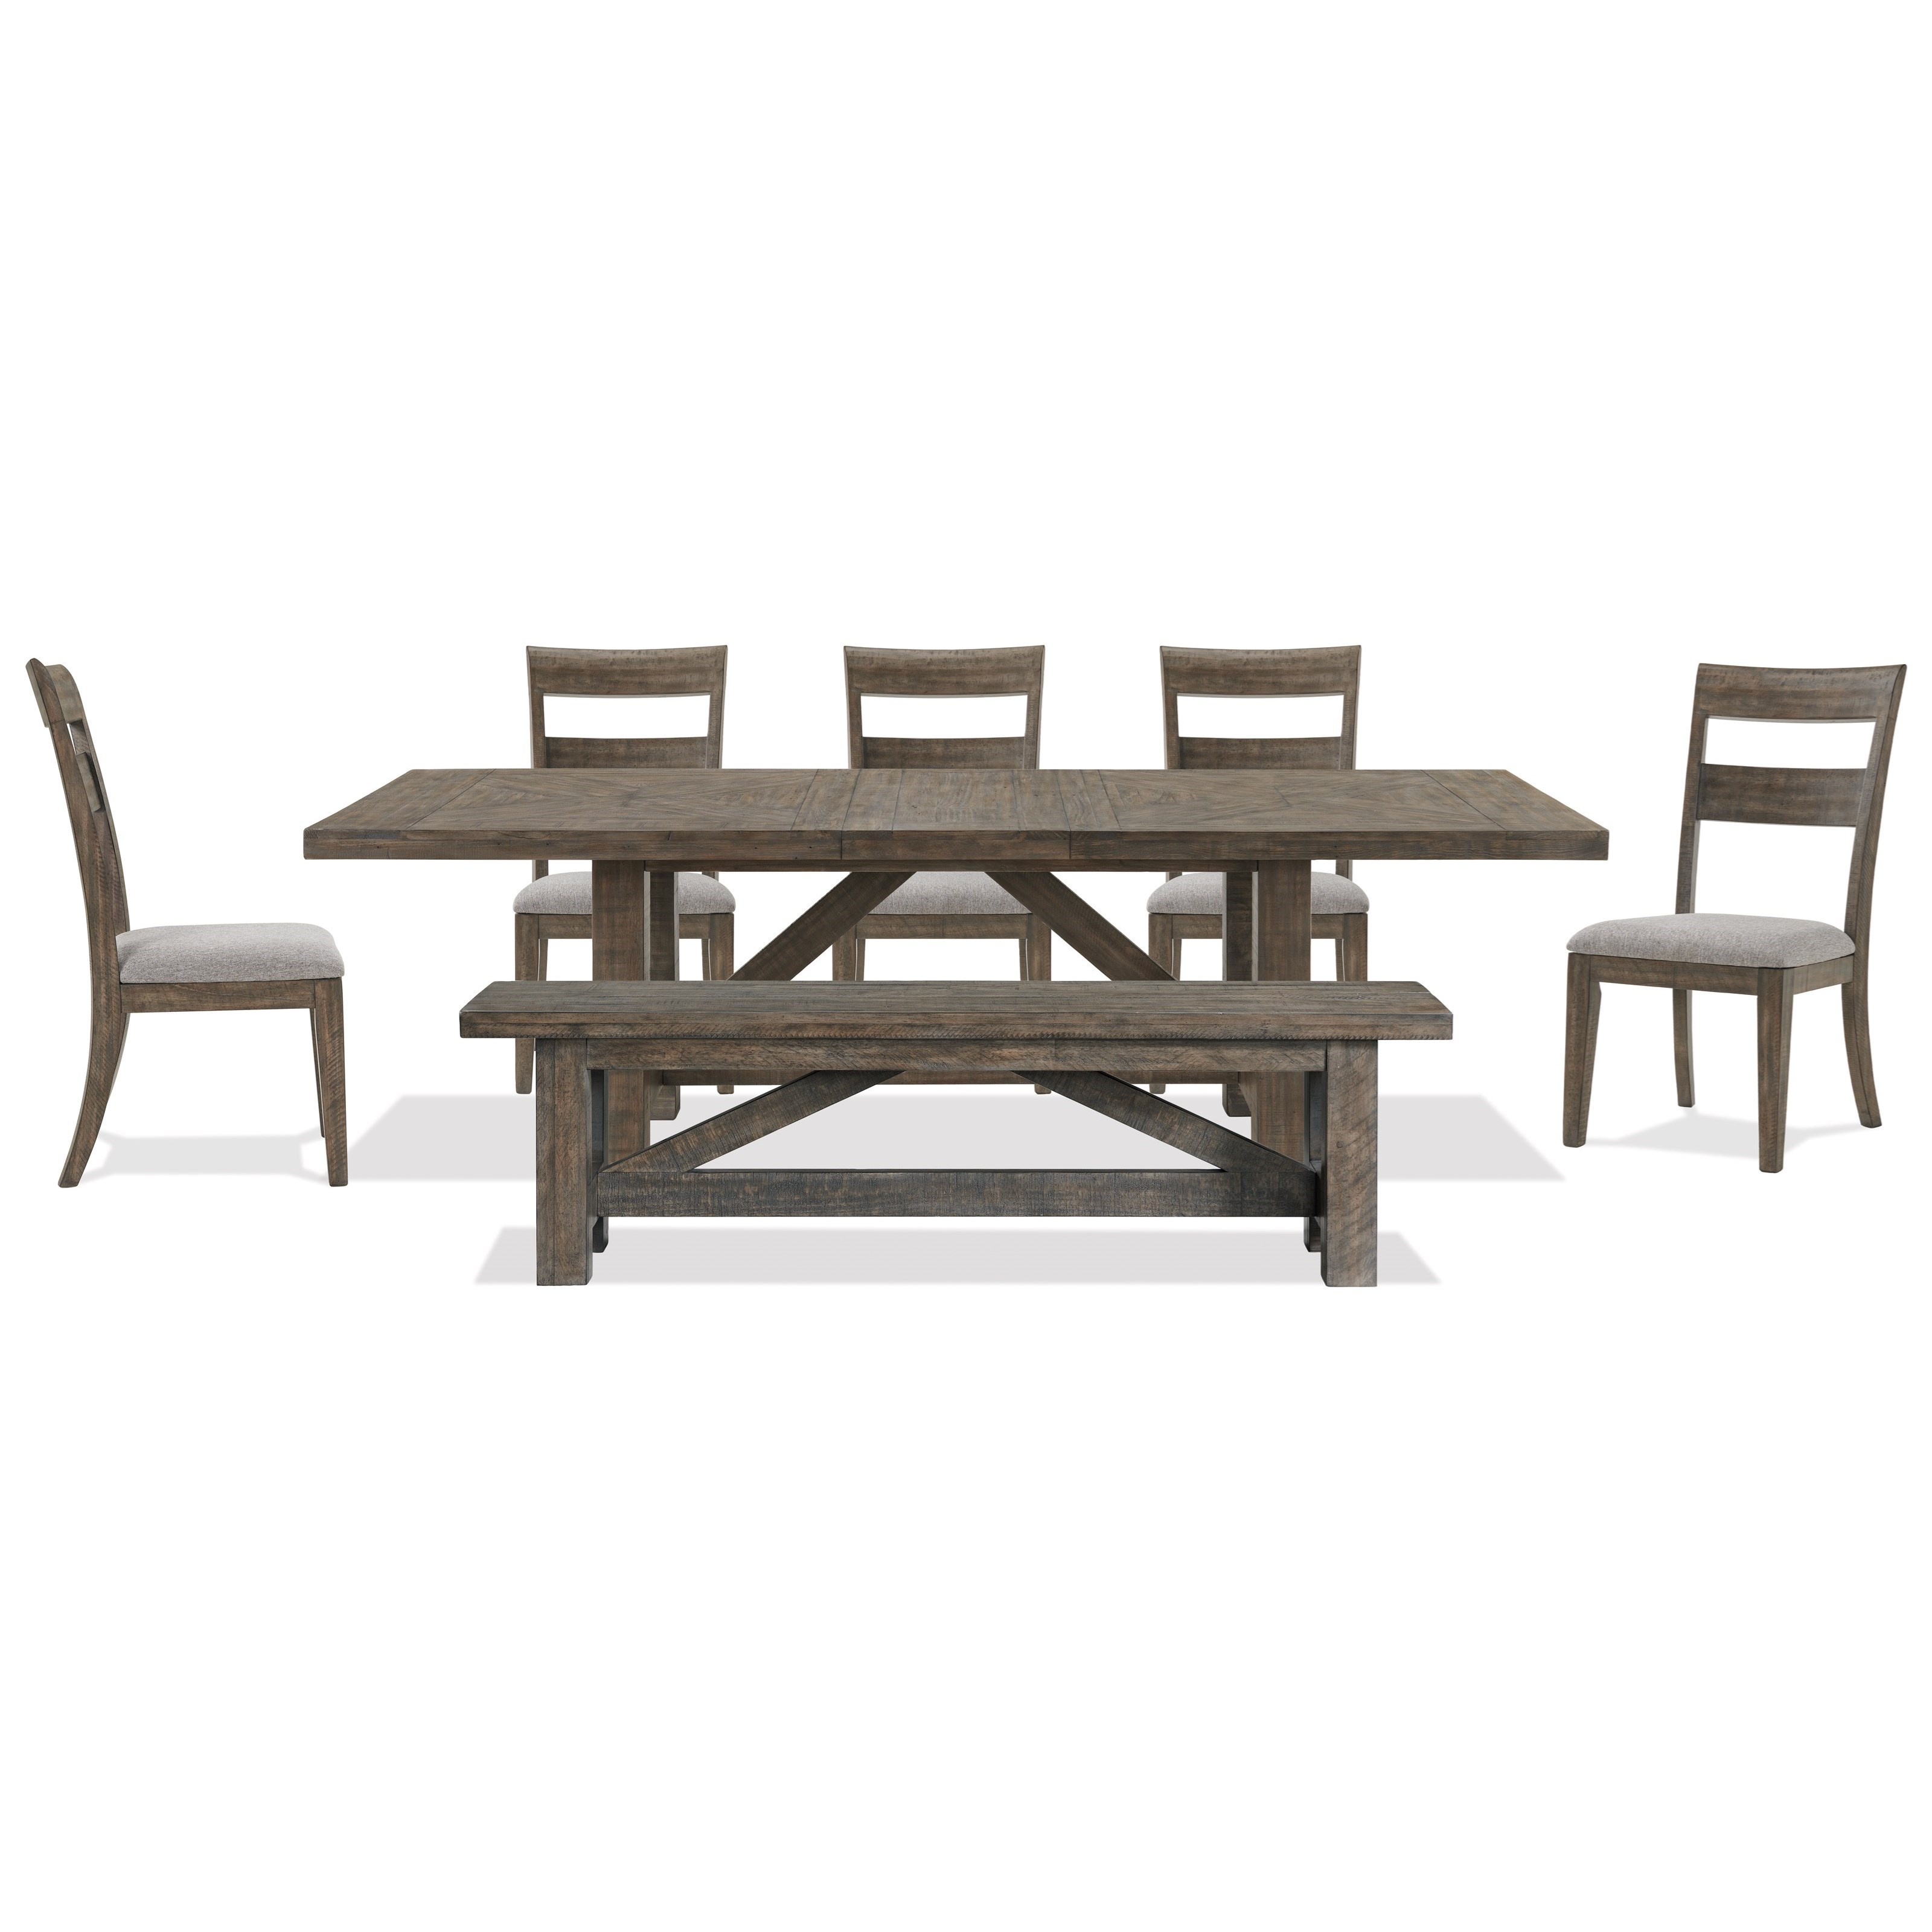 Bradford 7-Piece Dining Set  by Riverside Furniture at Zak's Home